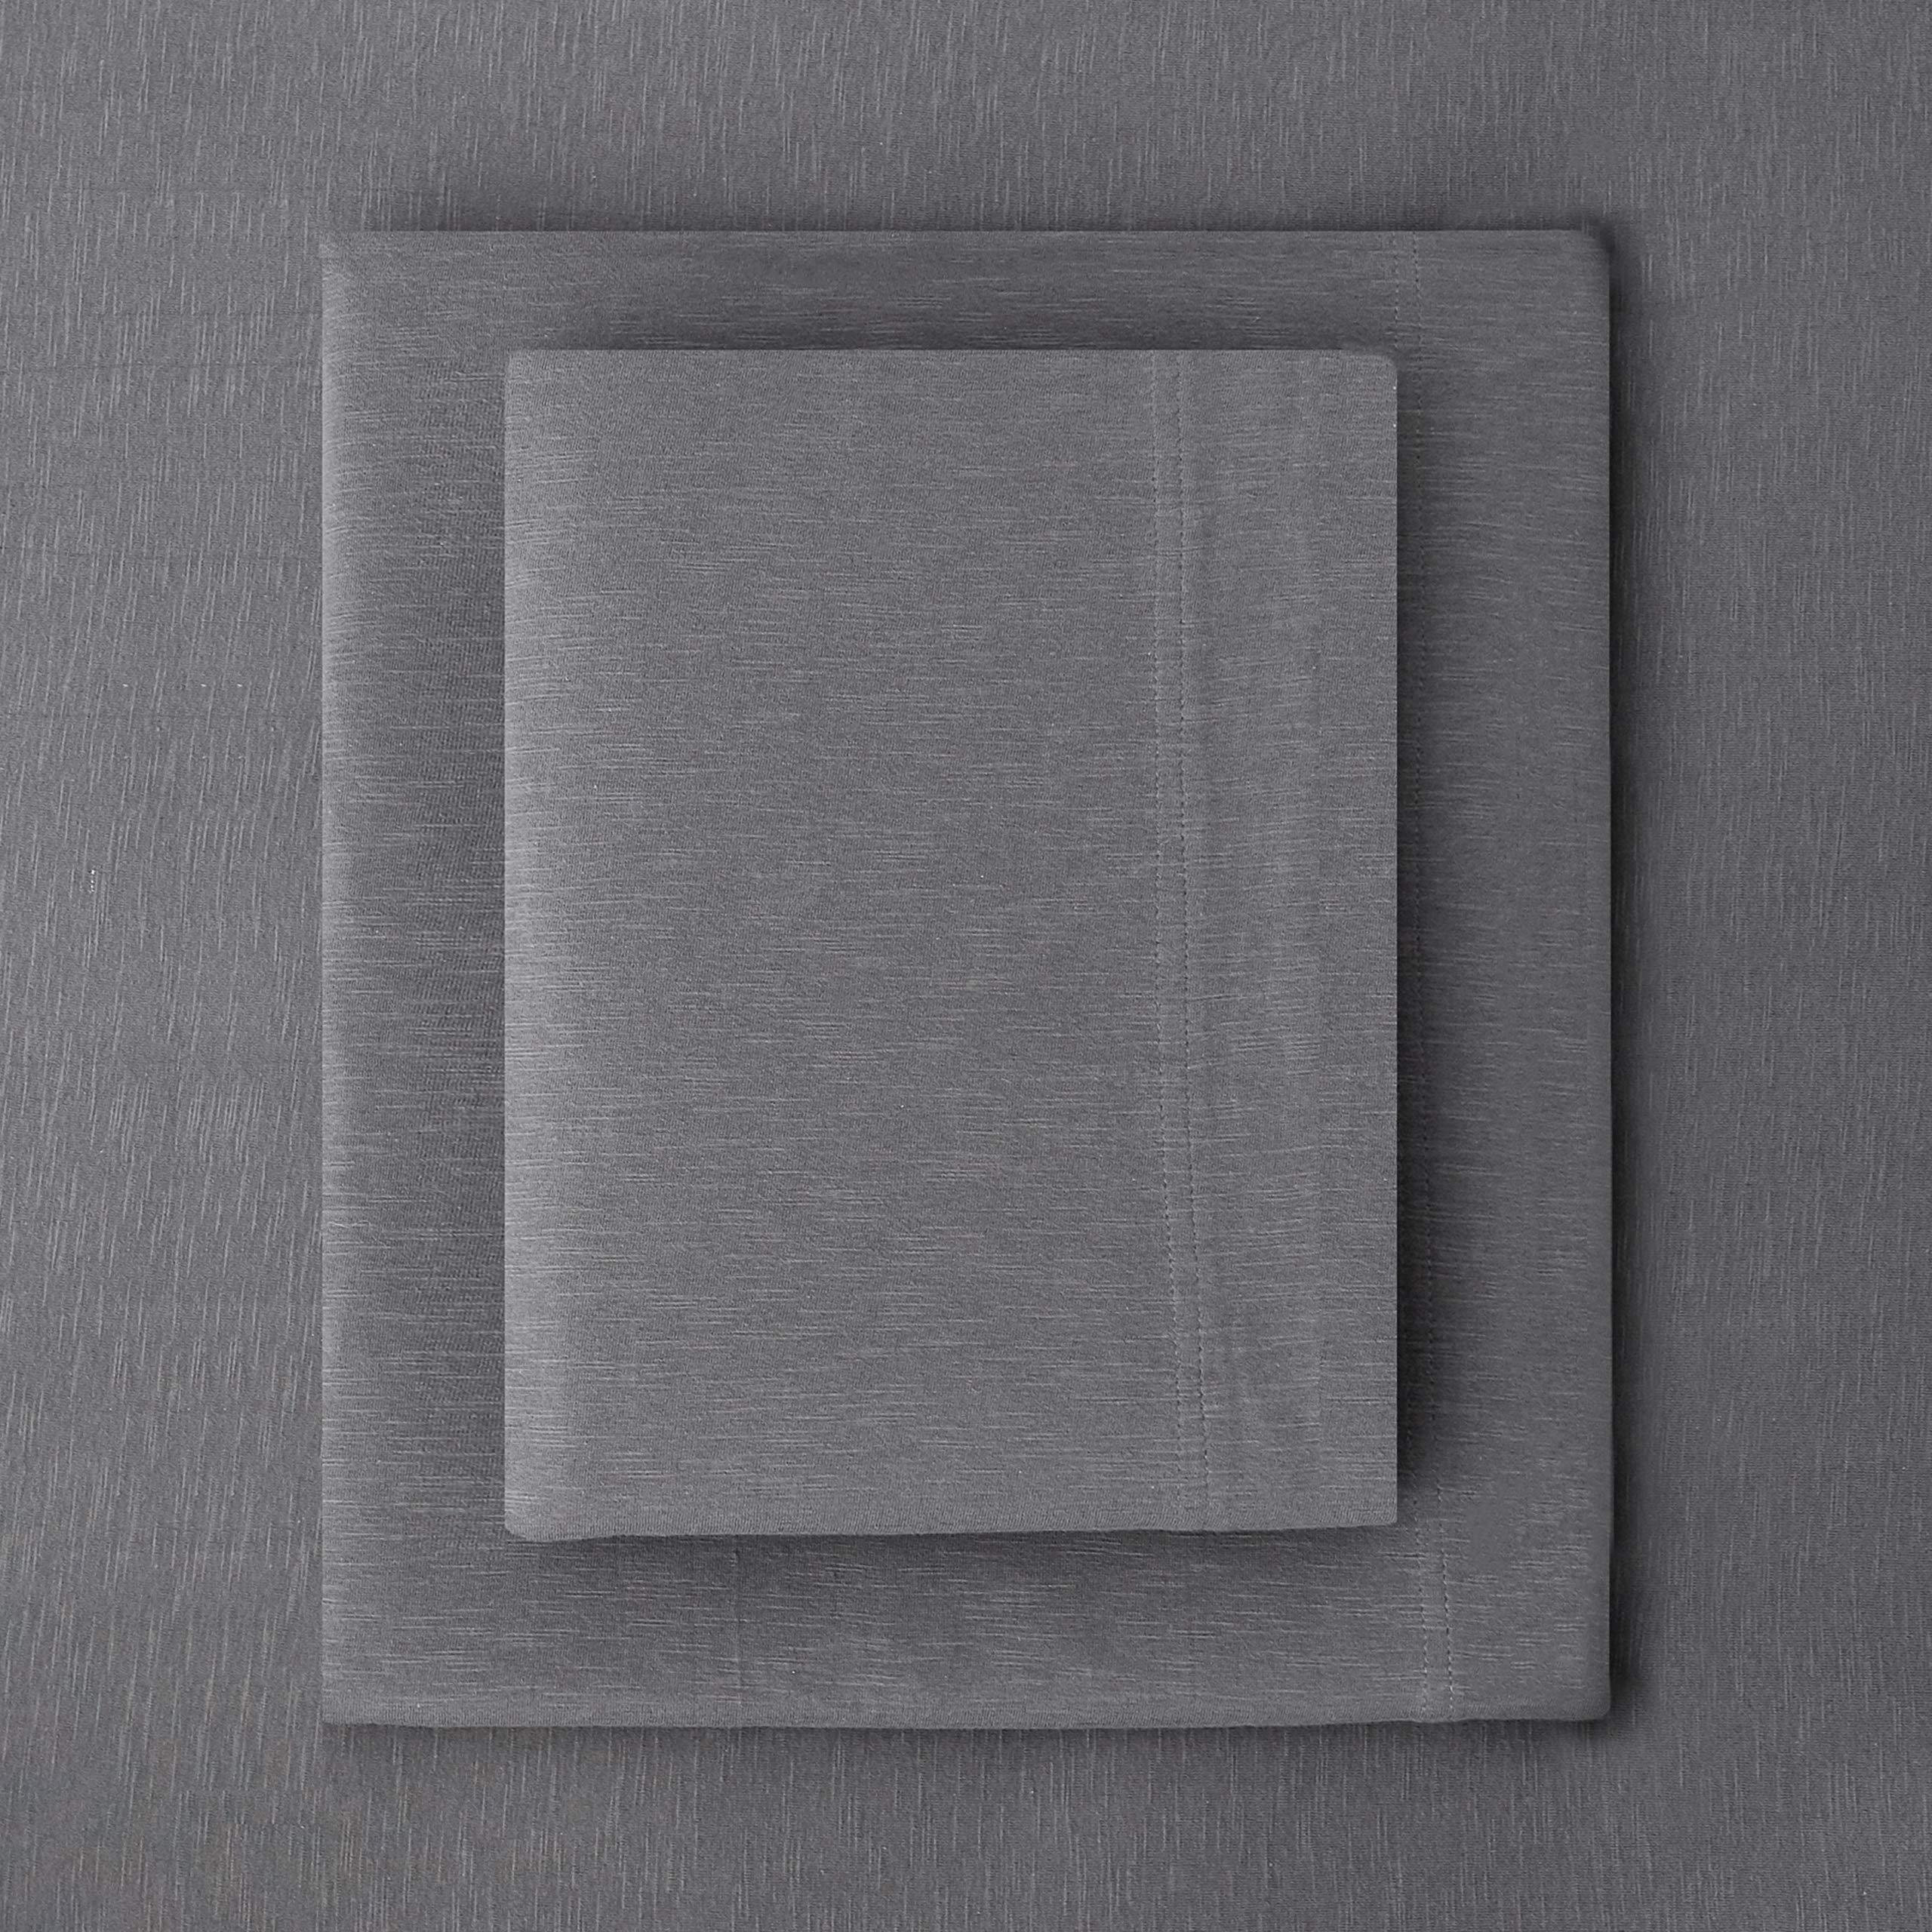 Splendid Home Slub Jersey Solid Sheet Set, King, Charcoal